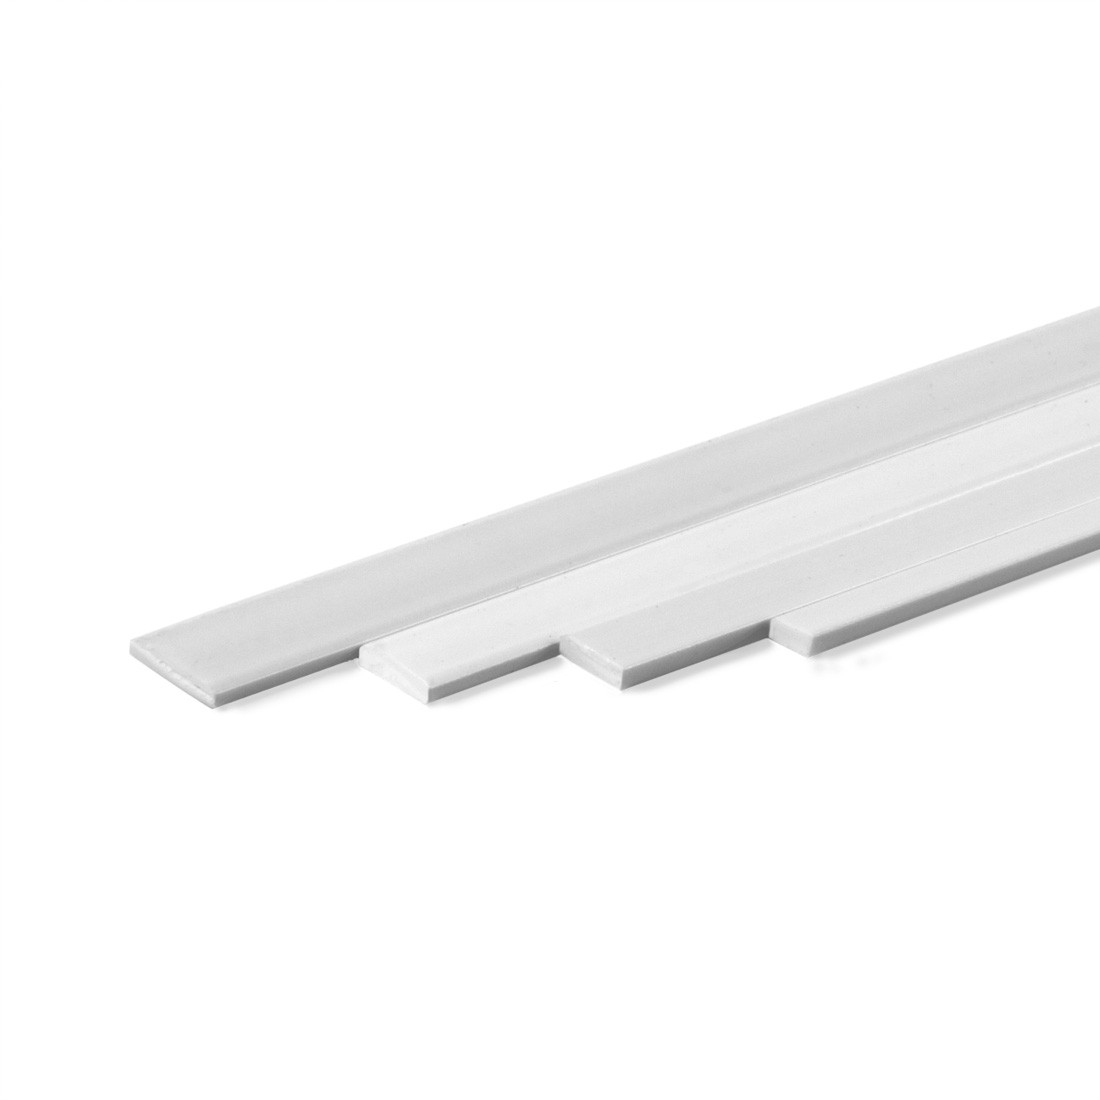 Profile ASA rectangulaire mm.1x5x1000